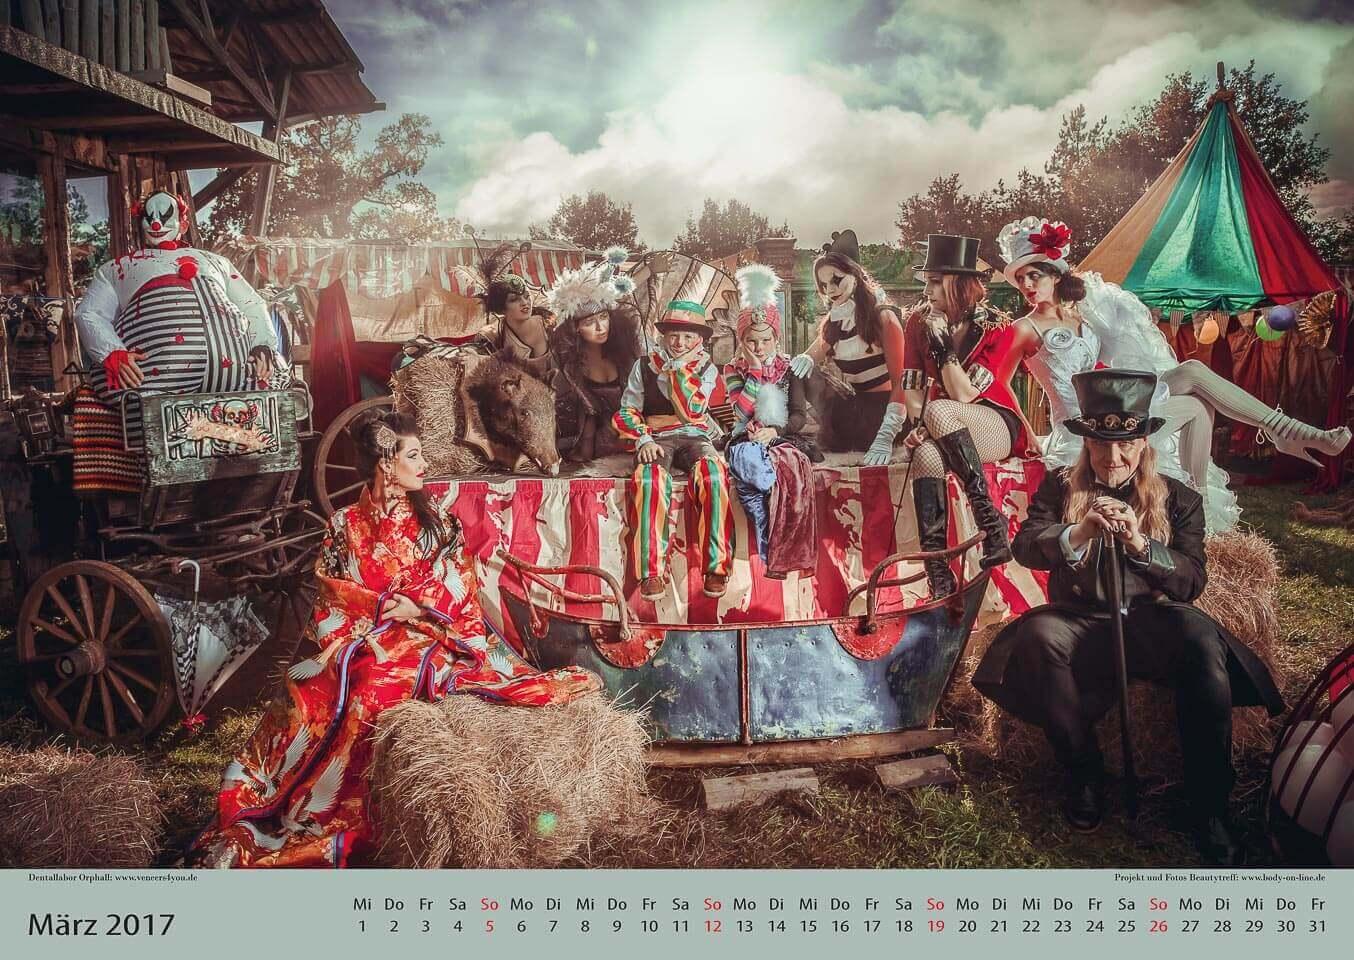 Fotograf-Fotostudio-Dresden-Zirkus-Shooting-Künstler-Artisten-Clown-Vorstellung-Tiere-Styling-Make up-Unterhaltung